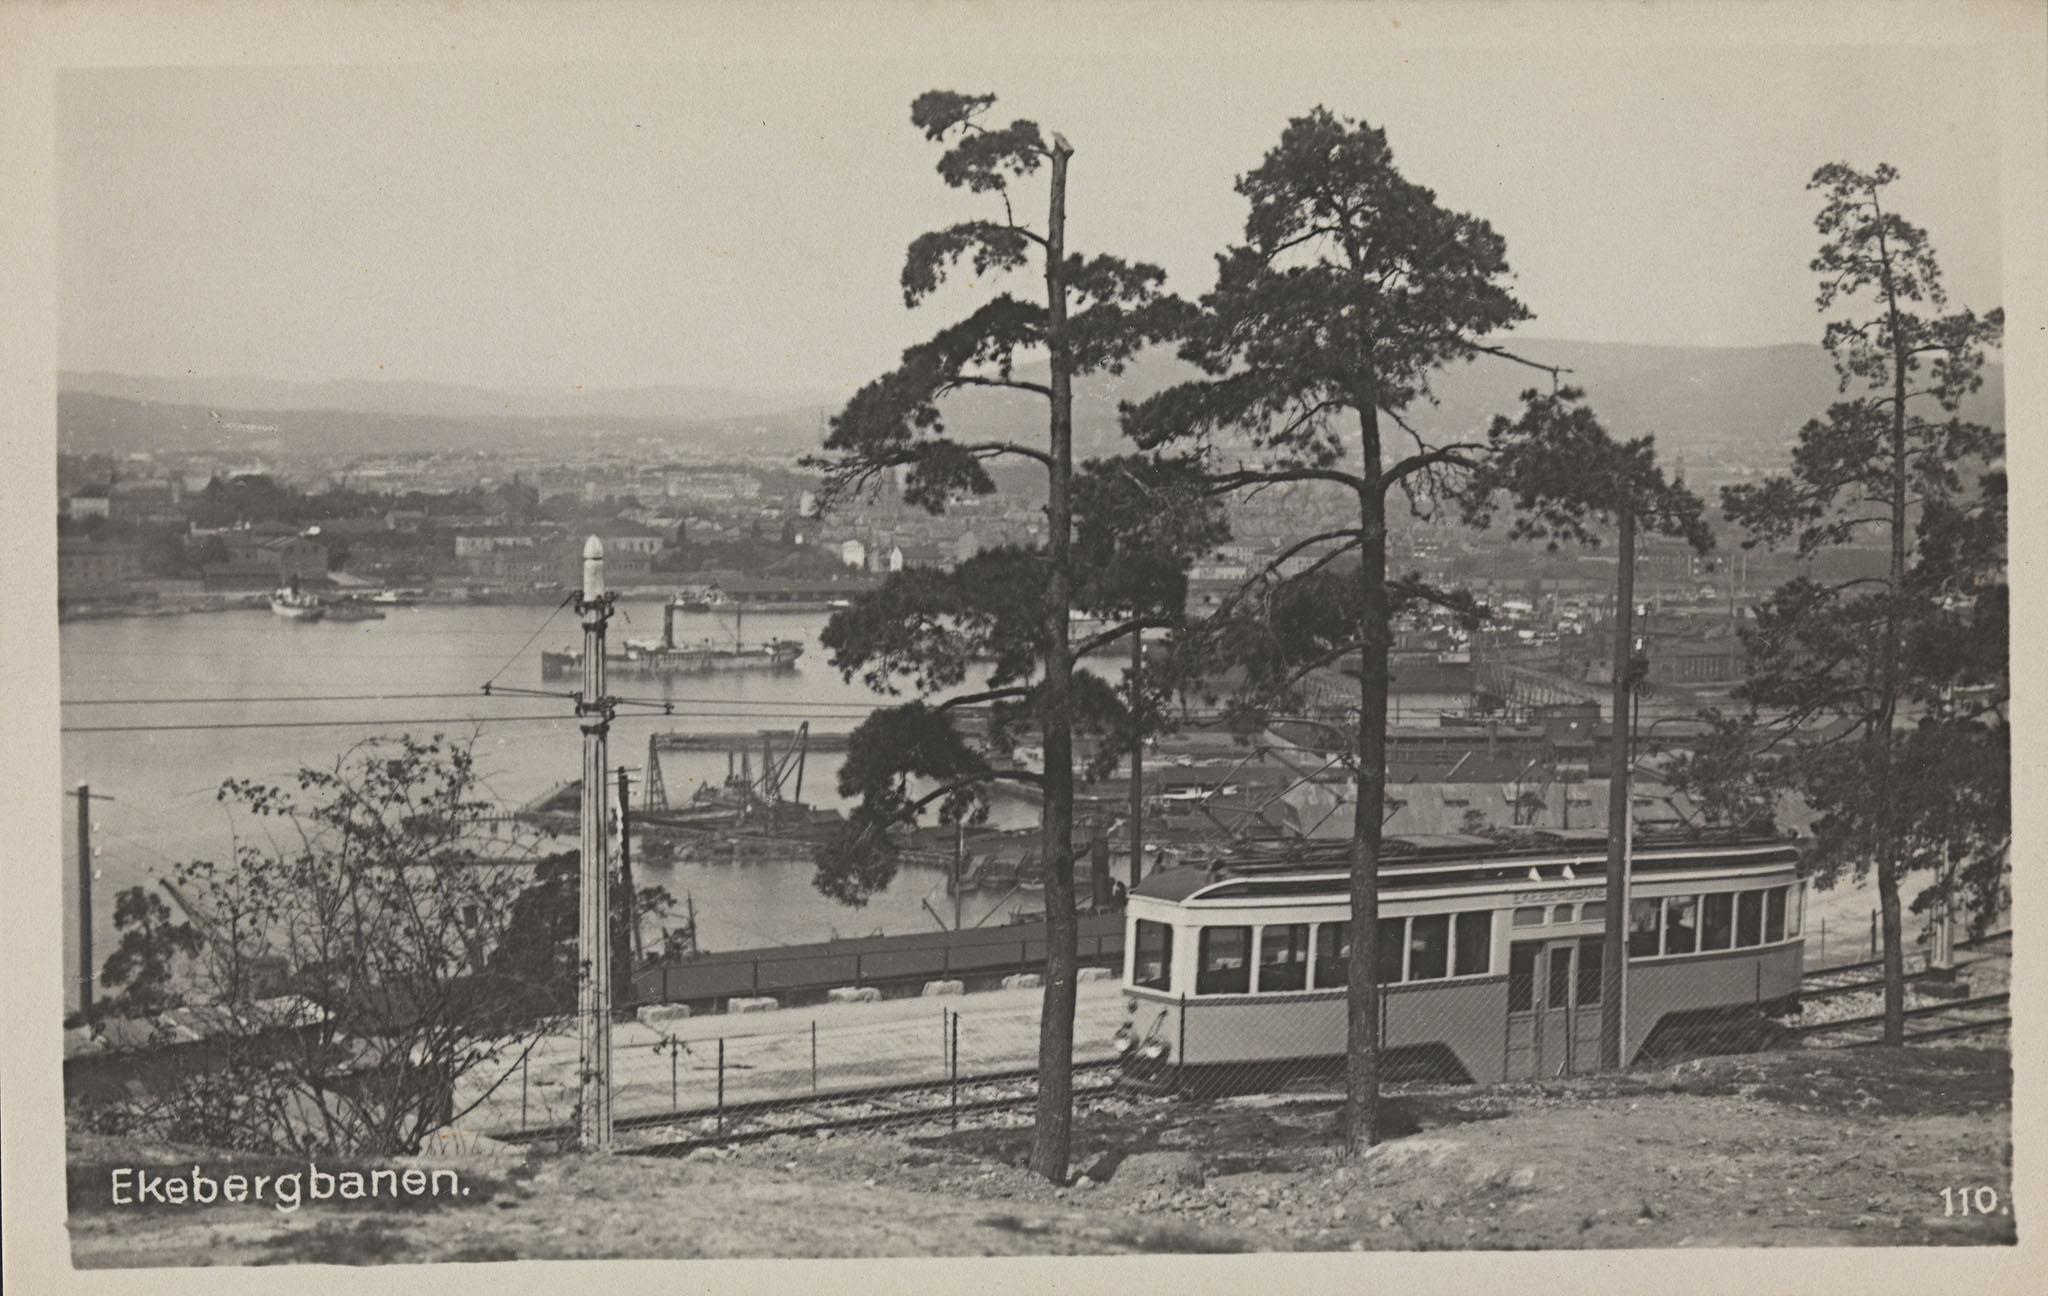 Ekebergbanen, ca 1922